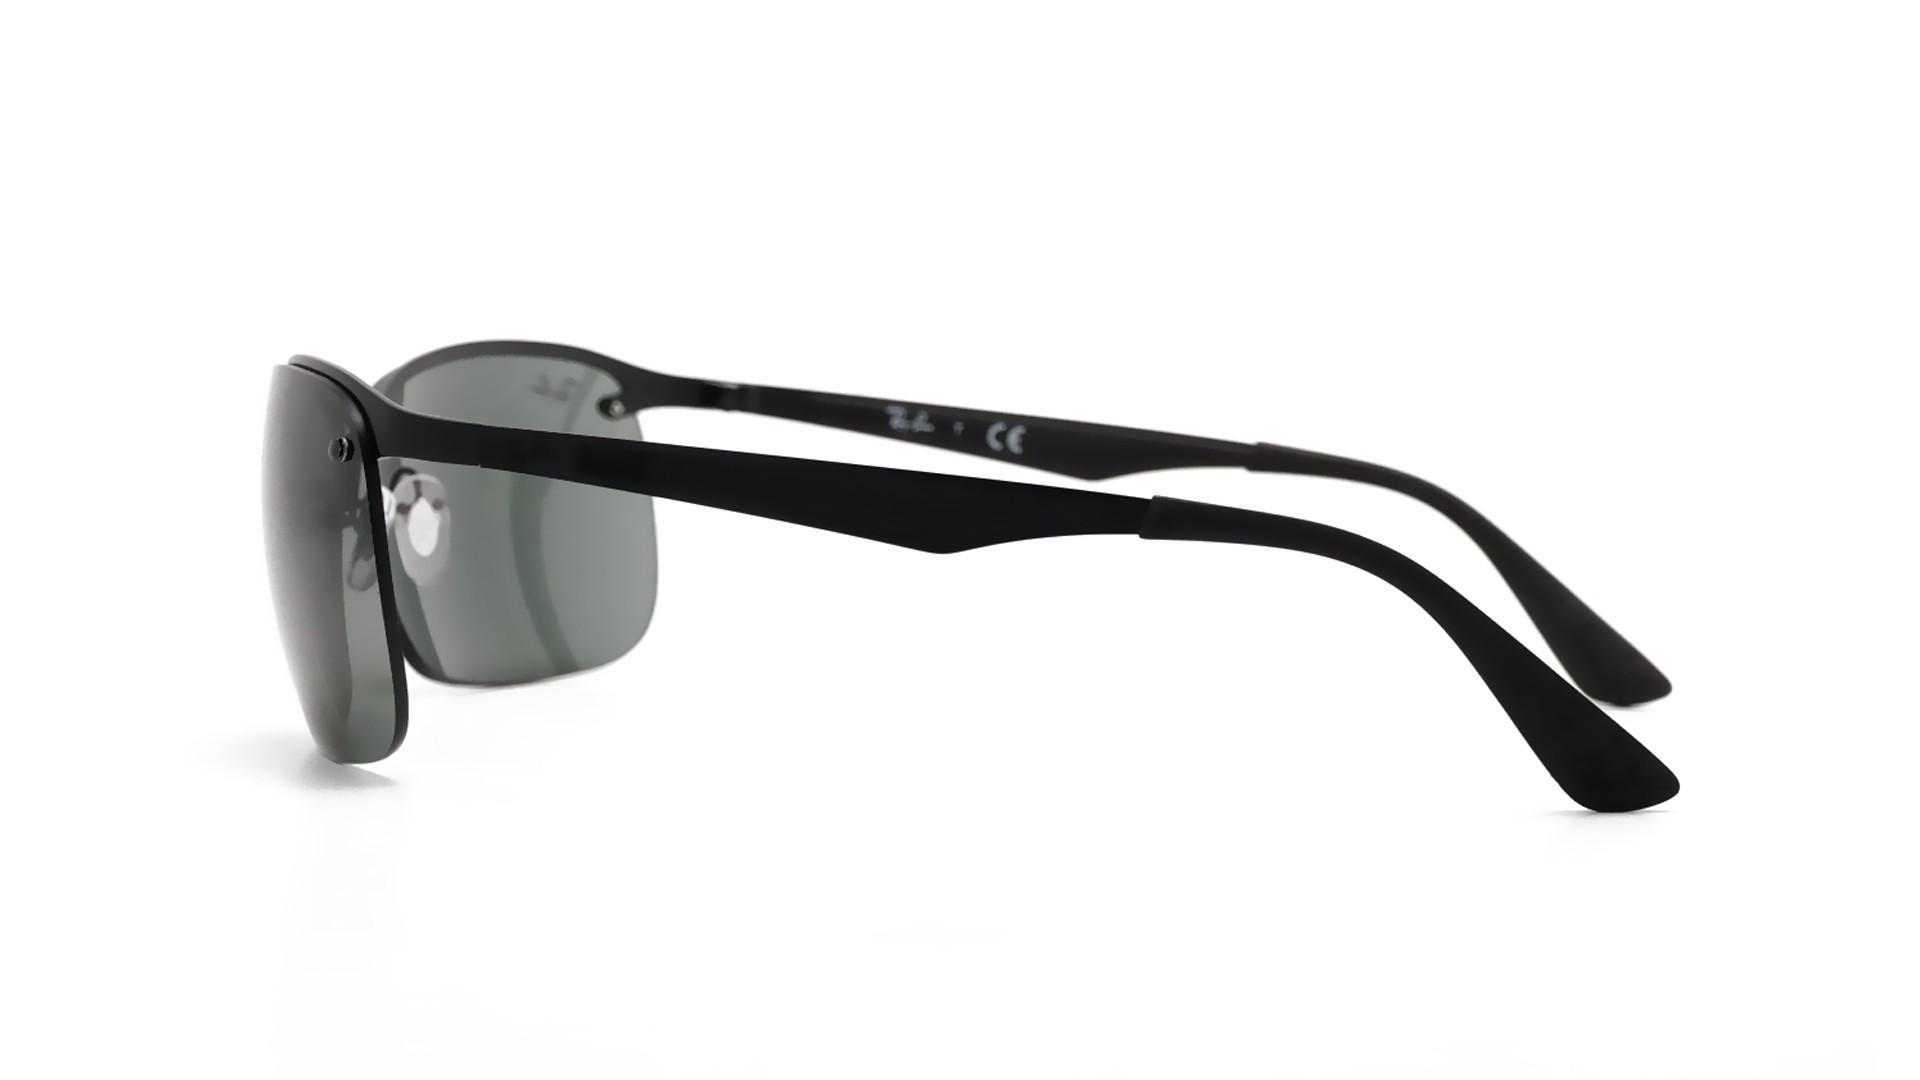 45c0fa957d Sunglasses Ray-Ban RB3550 006 71 64-15 Matte Black Large